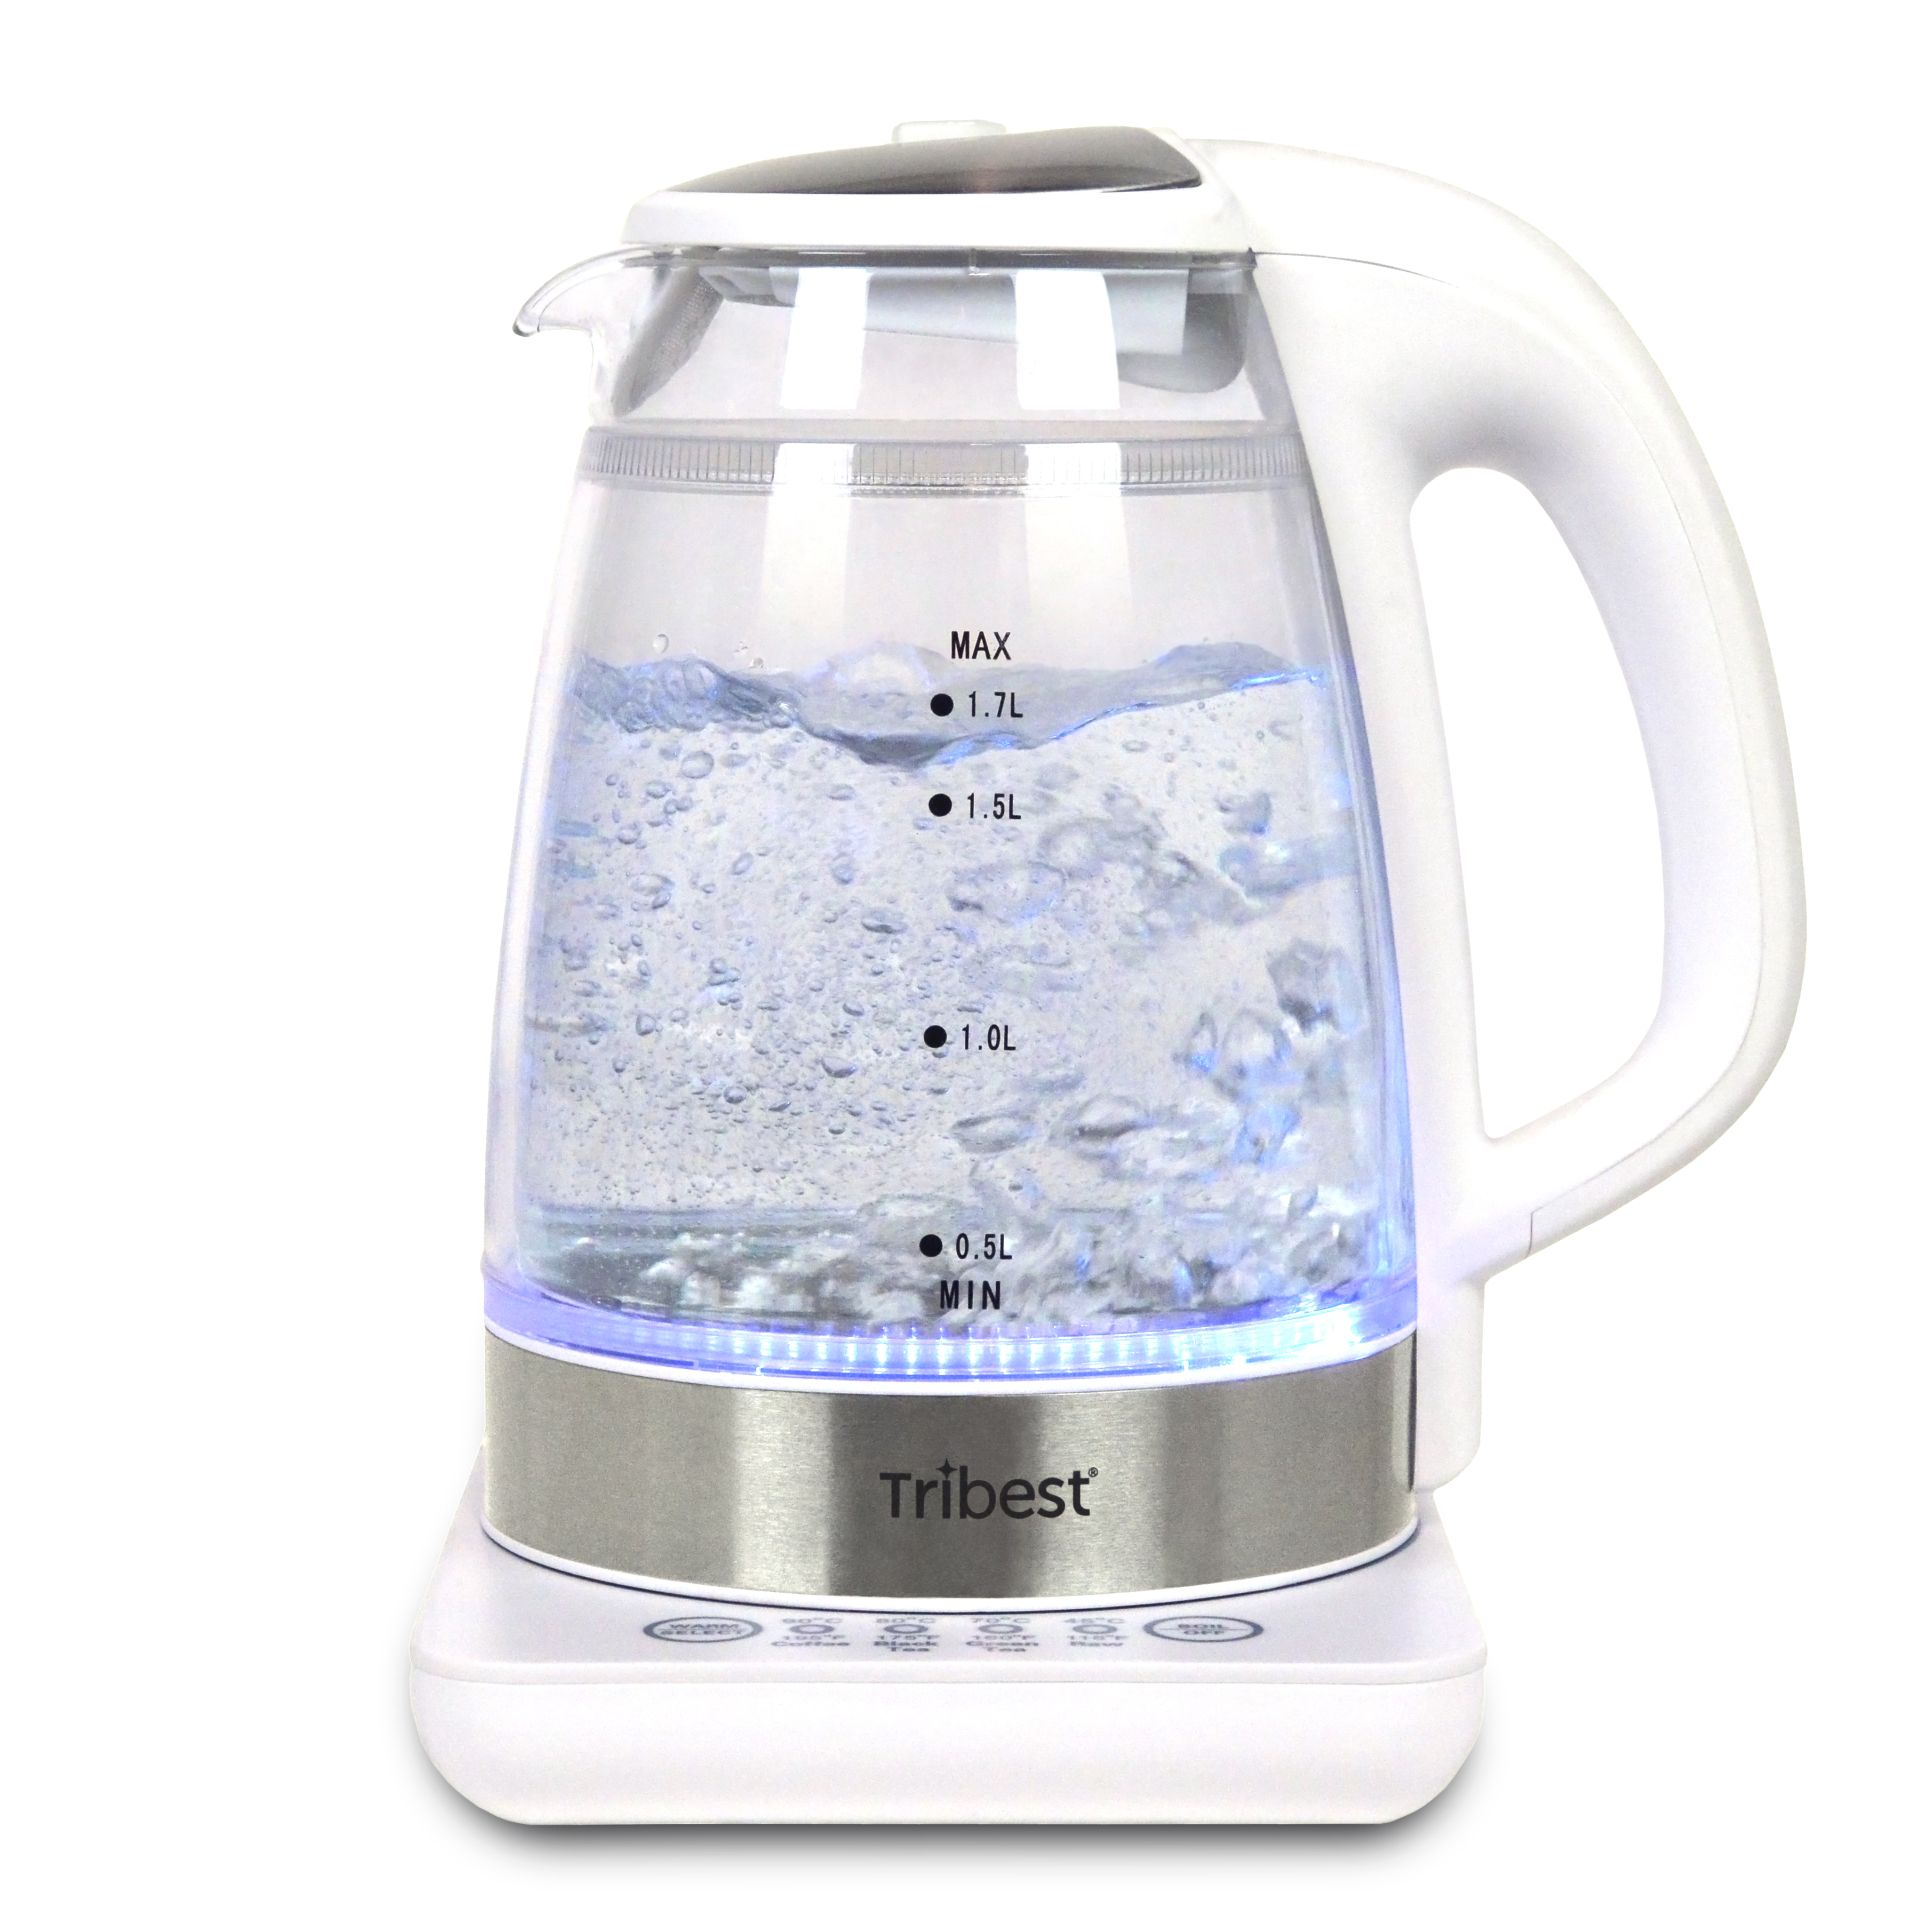 Tribest Wasserkocher GKD-450 in Betrieb